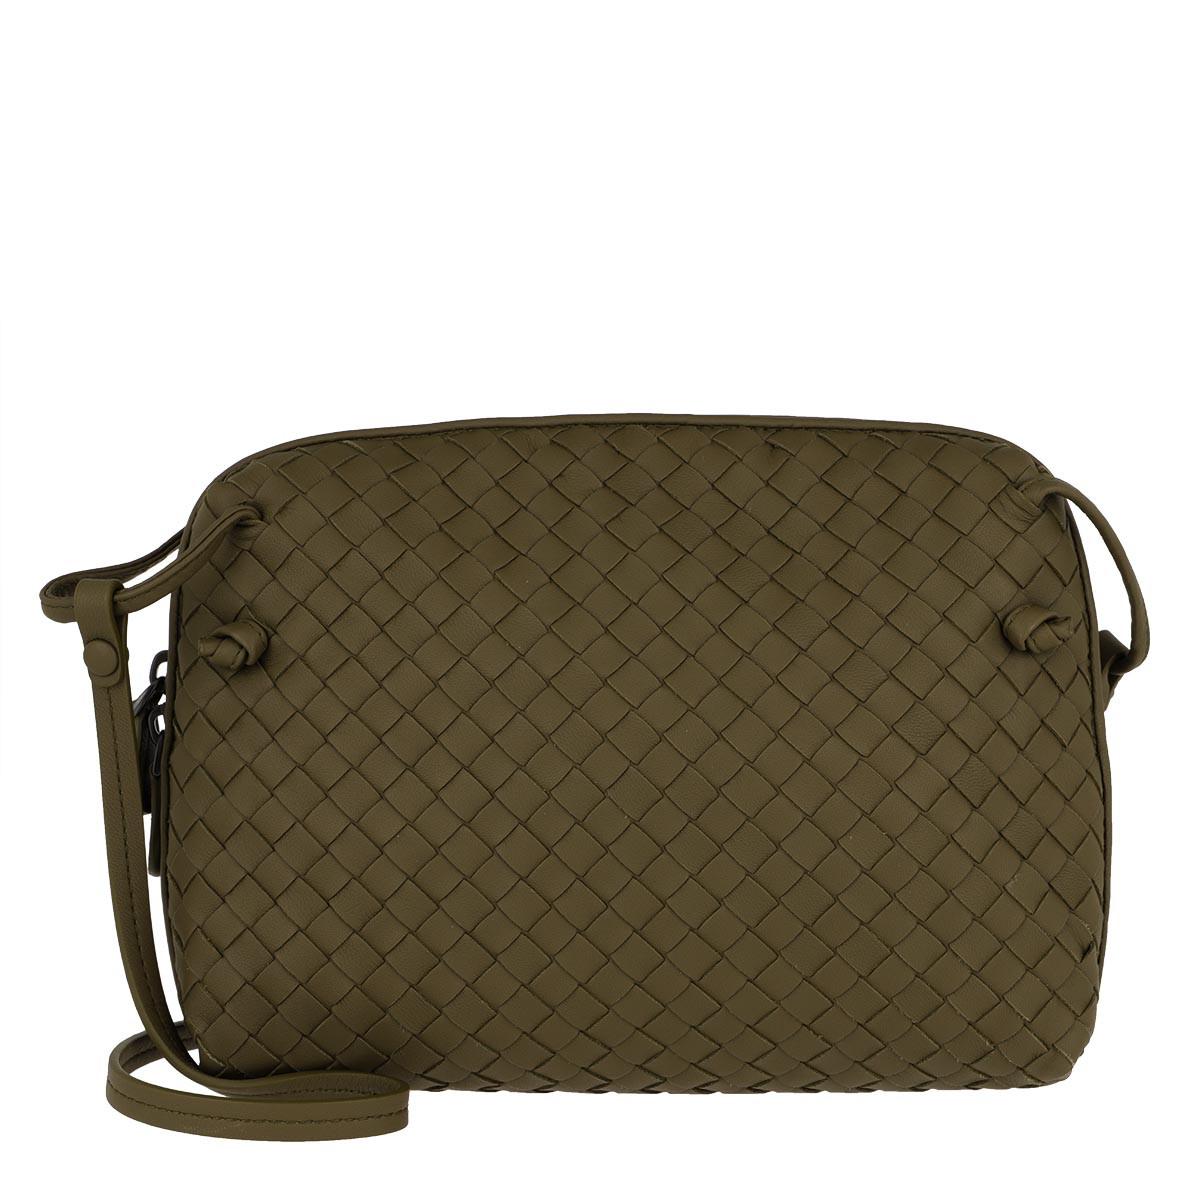 Bottega Veneta Umhängetasche - Messenger Crossbody Bag Intrecciato Mud - in grün - für Damen